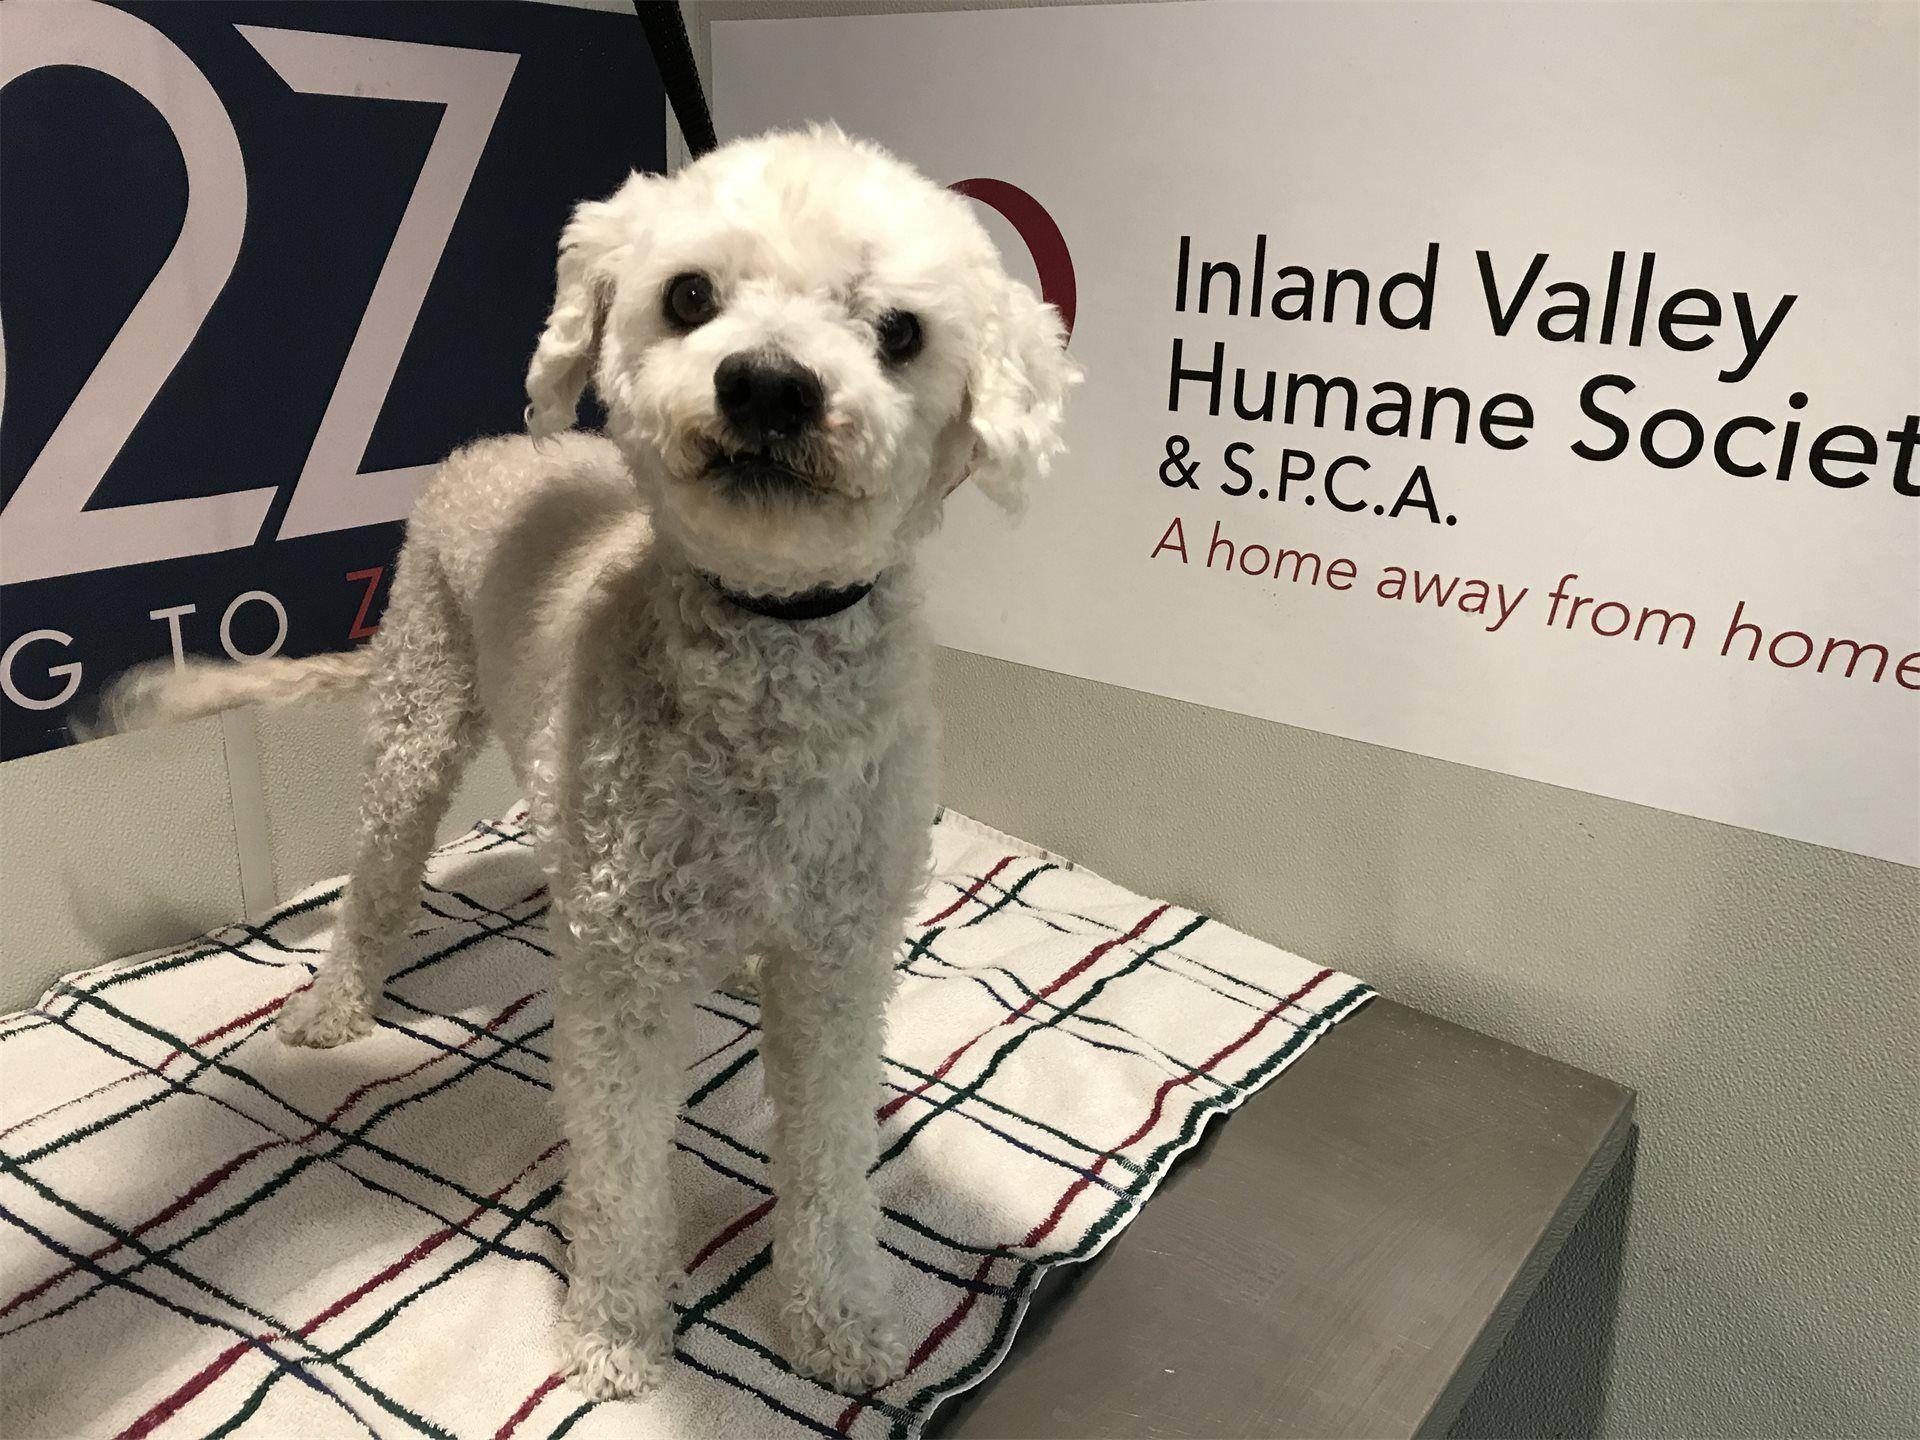 I1286412 Poodle Mix California Adoptdontshop Inland Valley Humane Society Humane Society Miniature Dogs Dog Adoption